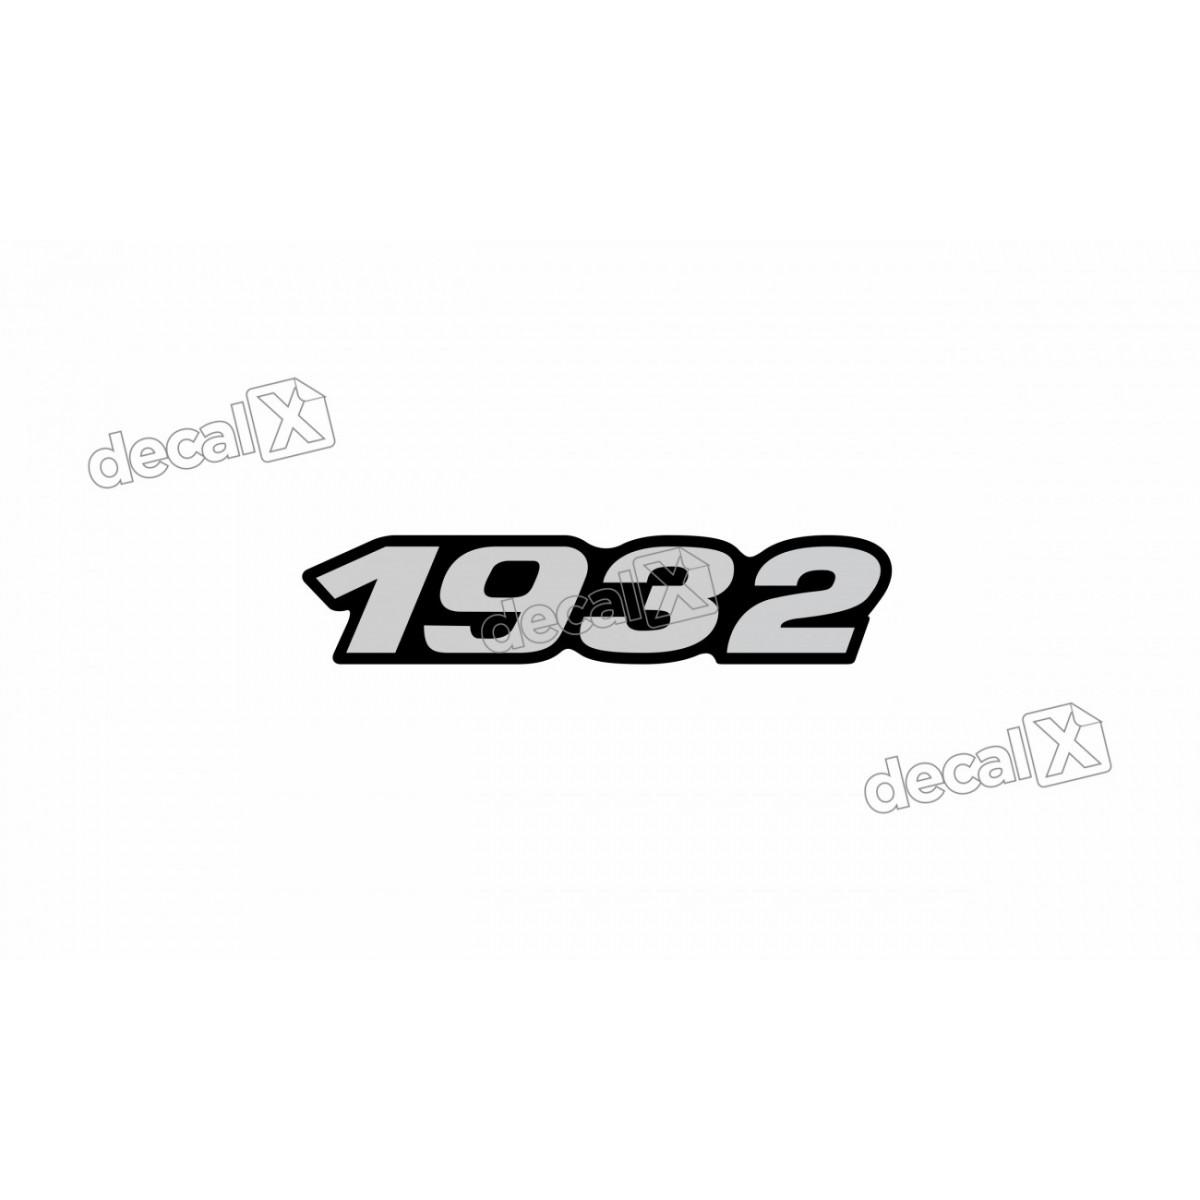 Adesivo Emblema Resinado Mercedes 1932 Cm67 Decalx